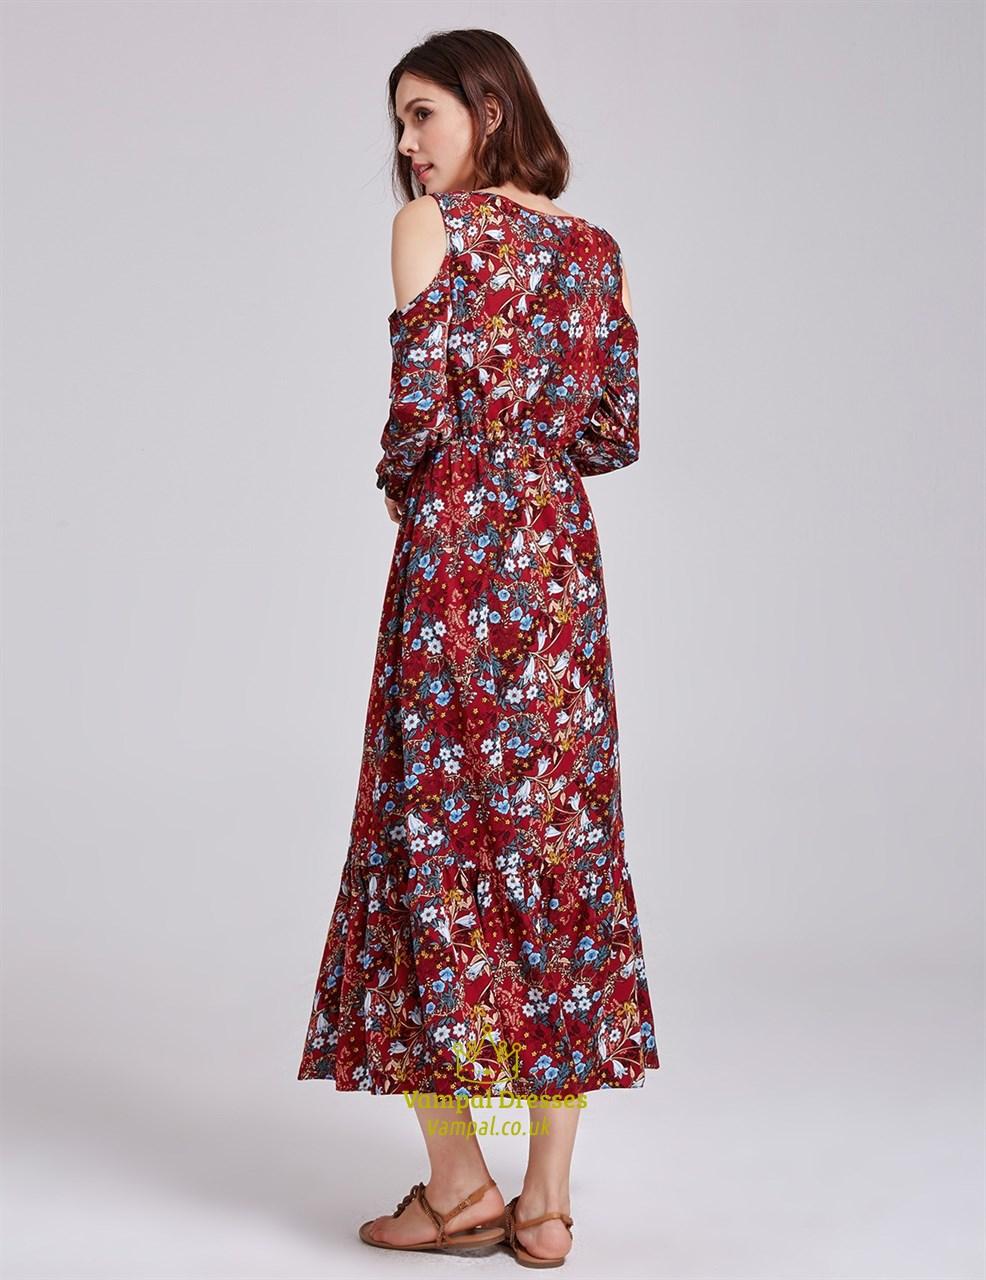 Tea Length Floral Print Dress